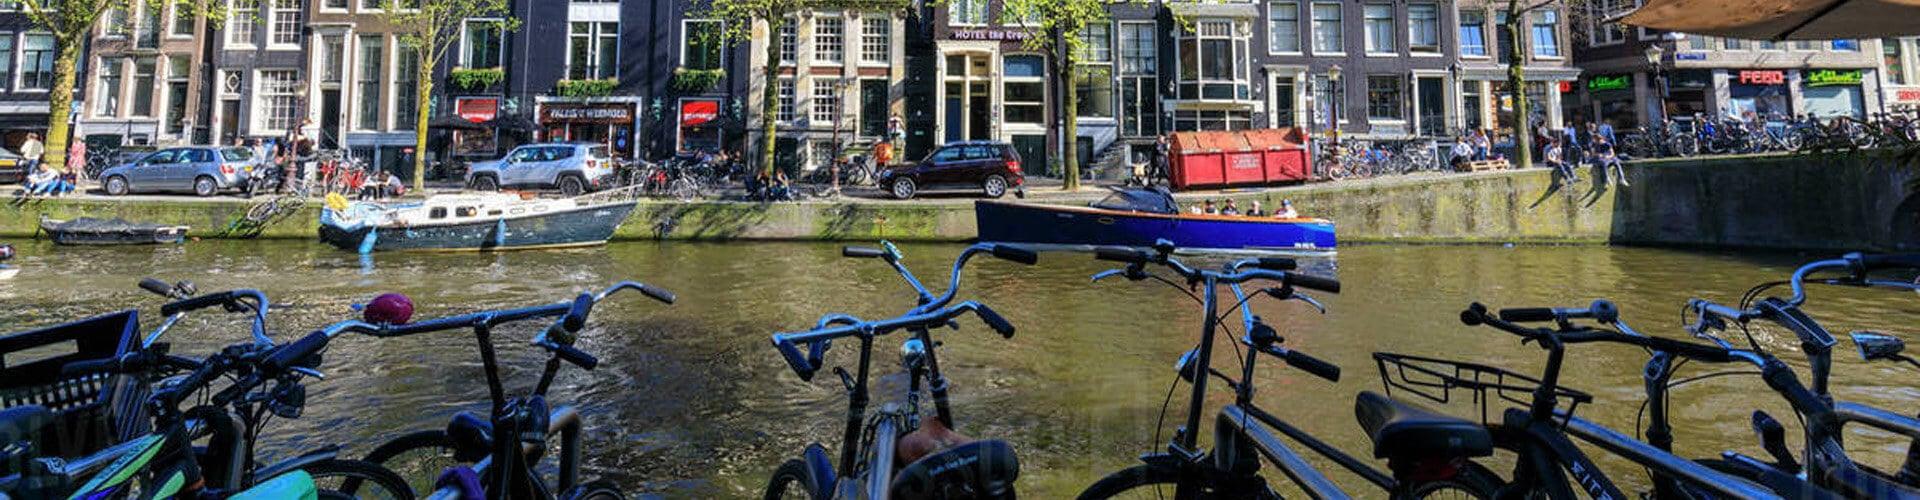 Amsterdam, Netherlands: The City of Bikes